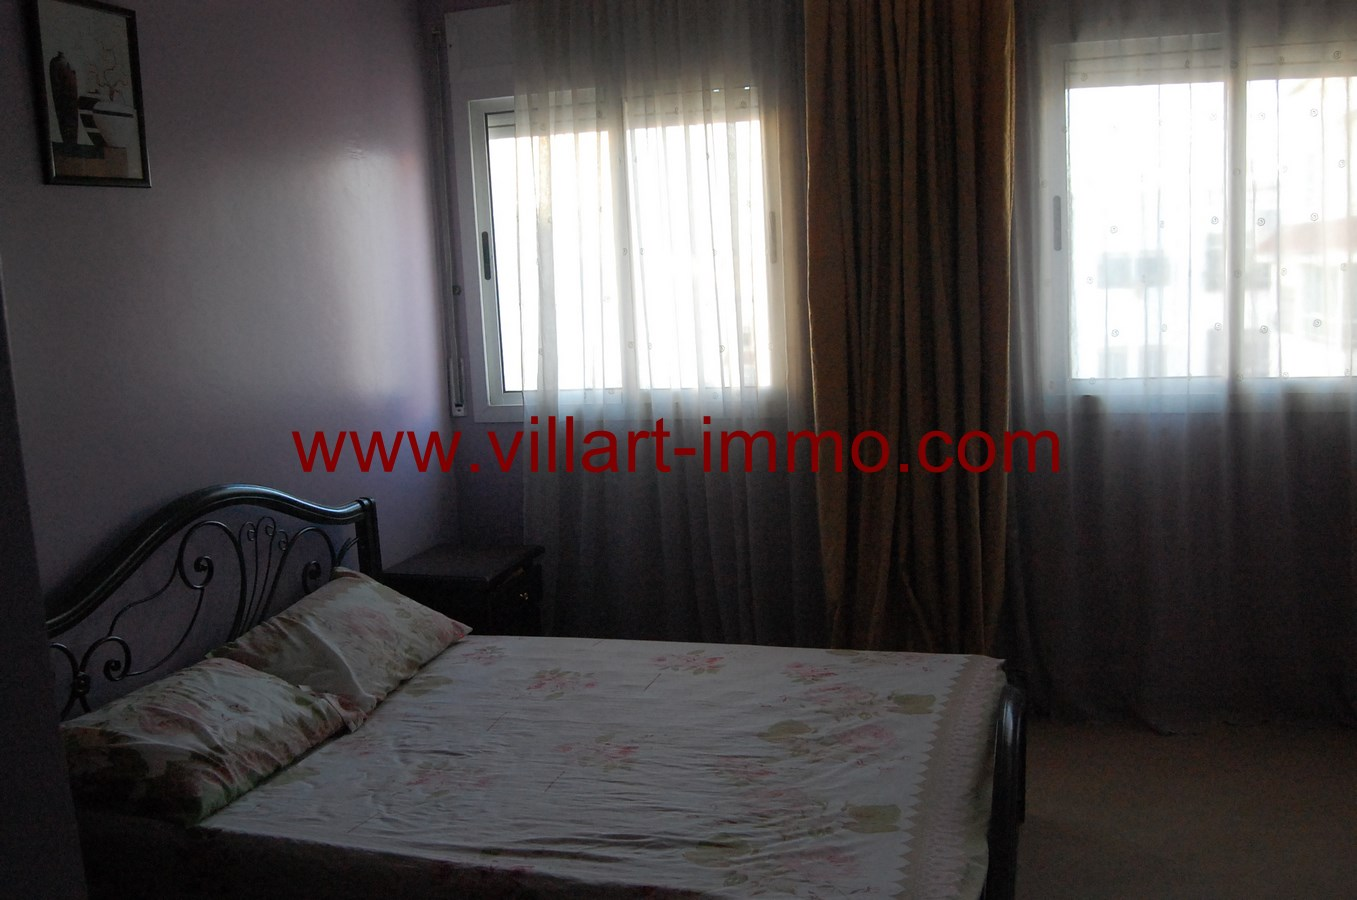 3-vente-appartement-tanger-val-fleuri-chambre-2-va448-villart-immo